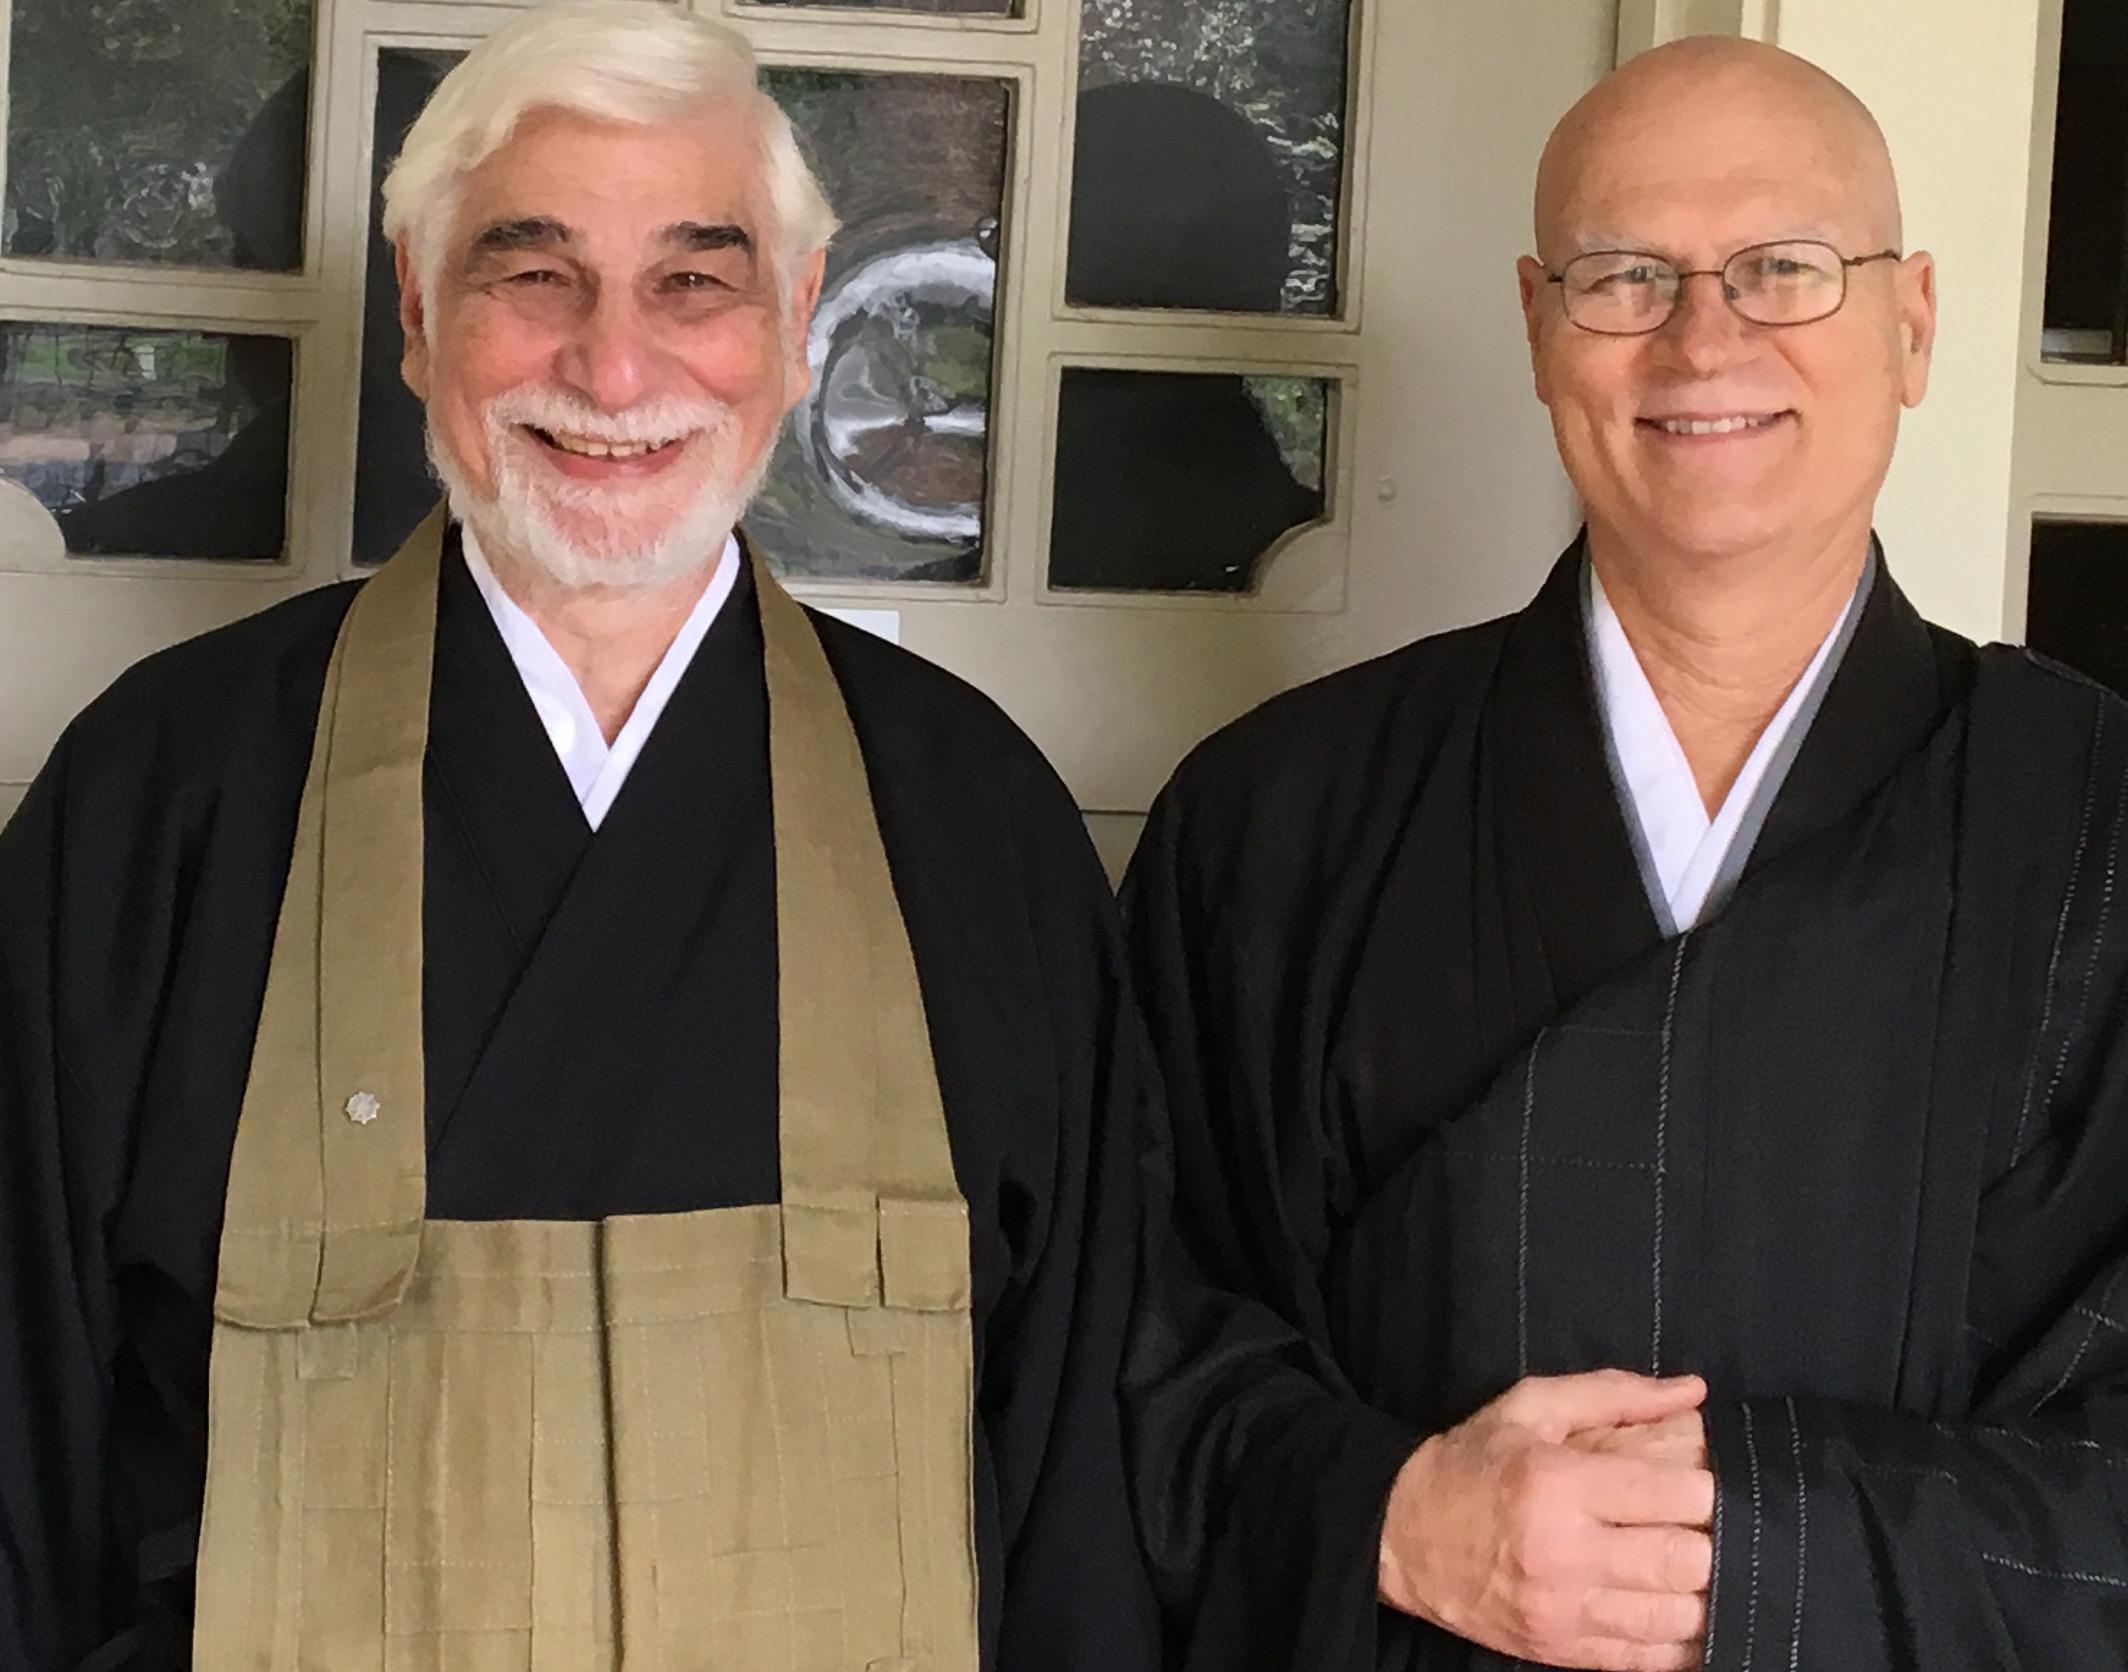 Kogen Glen and Yazan Dave Johnson after Kogen received Lay Dharma Entrustment